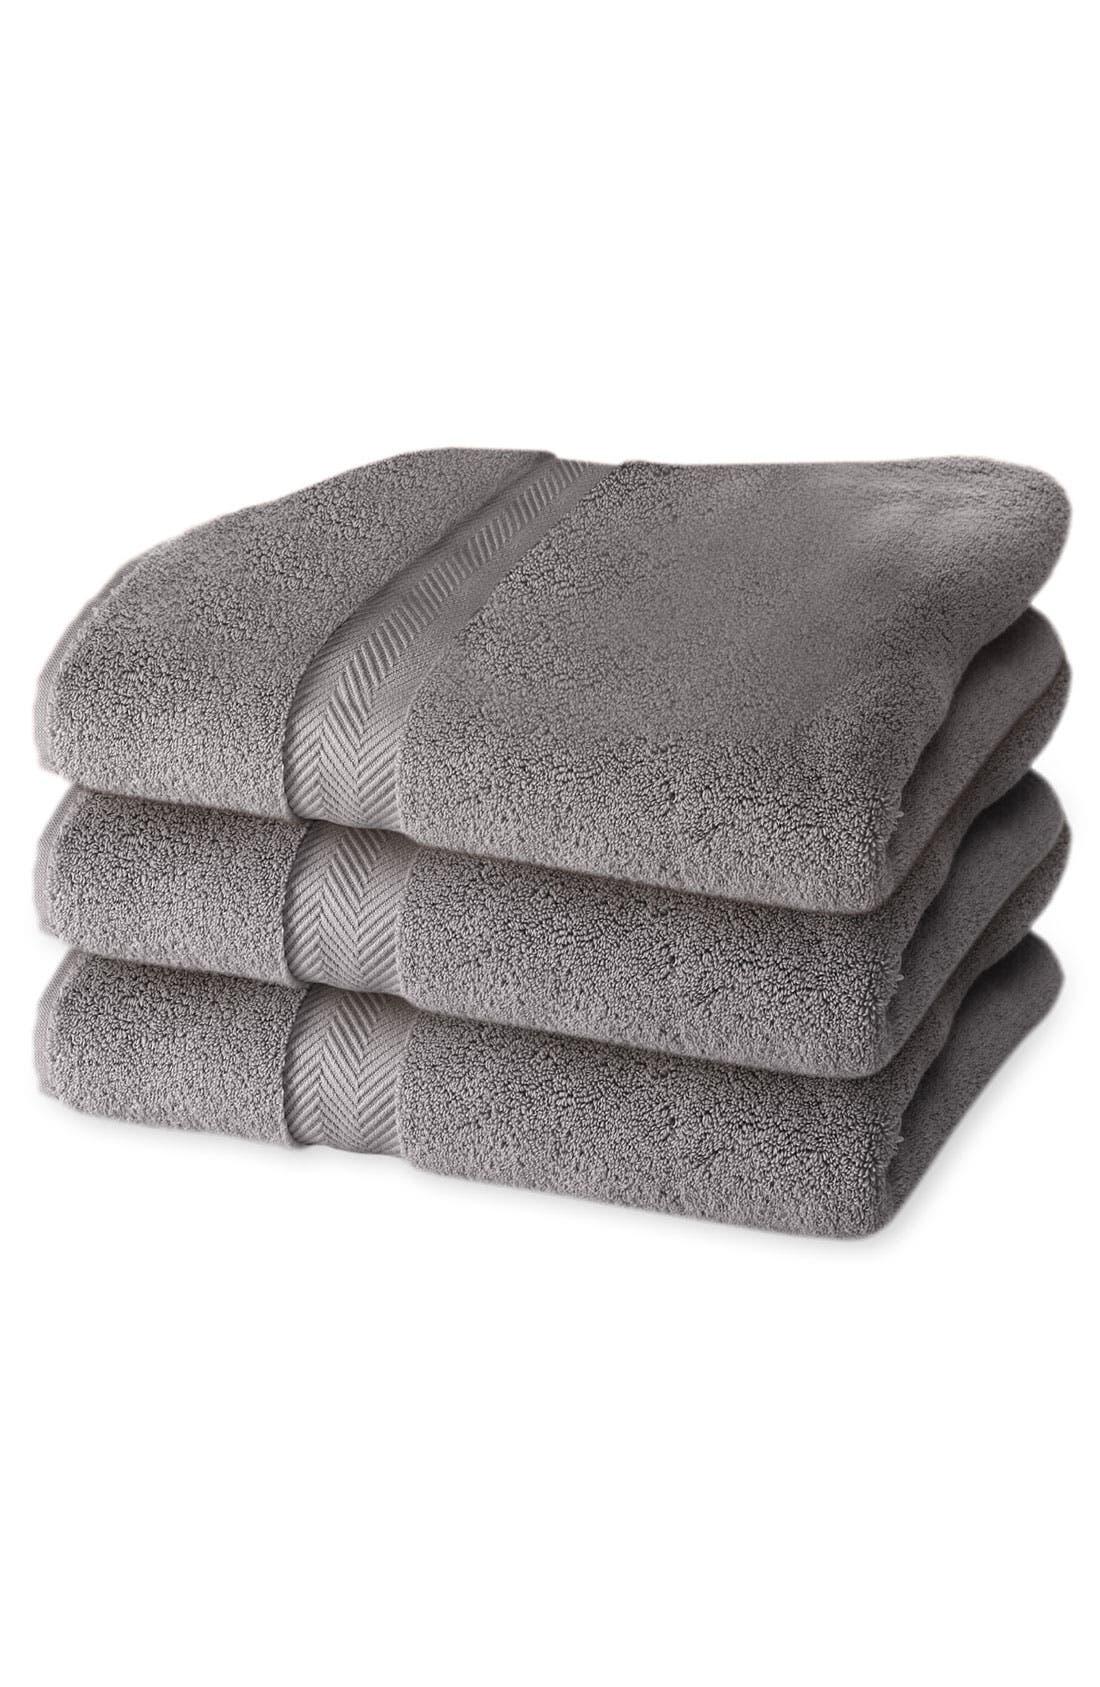 Hydrocotton Bath Towel,                             Alternate thumbnail 5, color,                             GRAPHITE